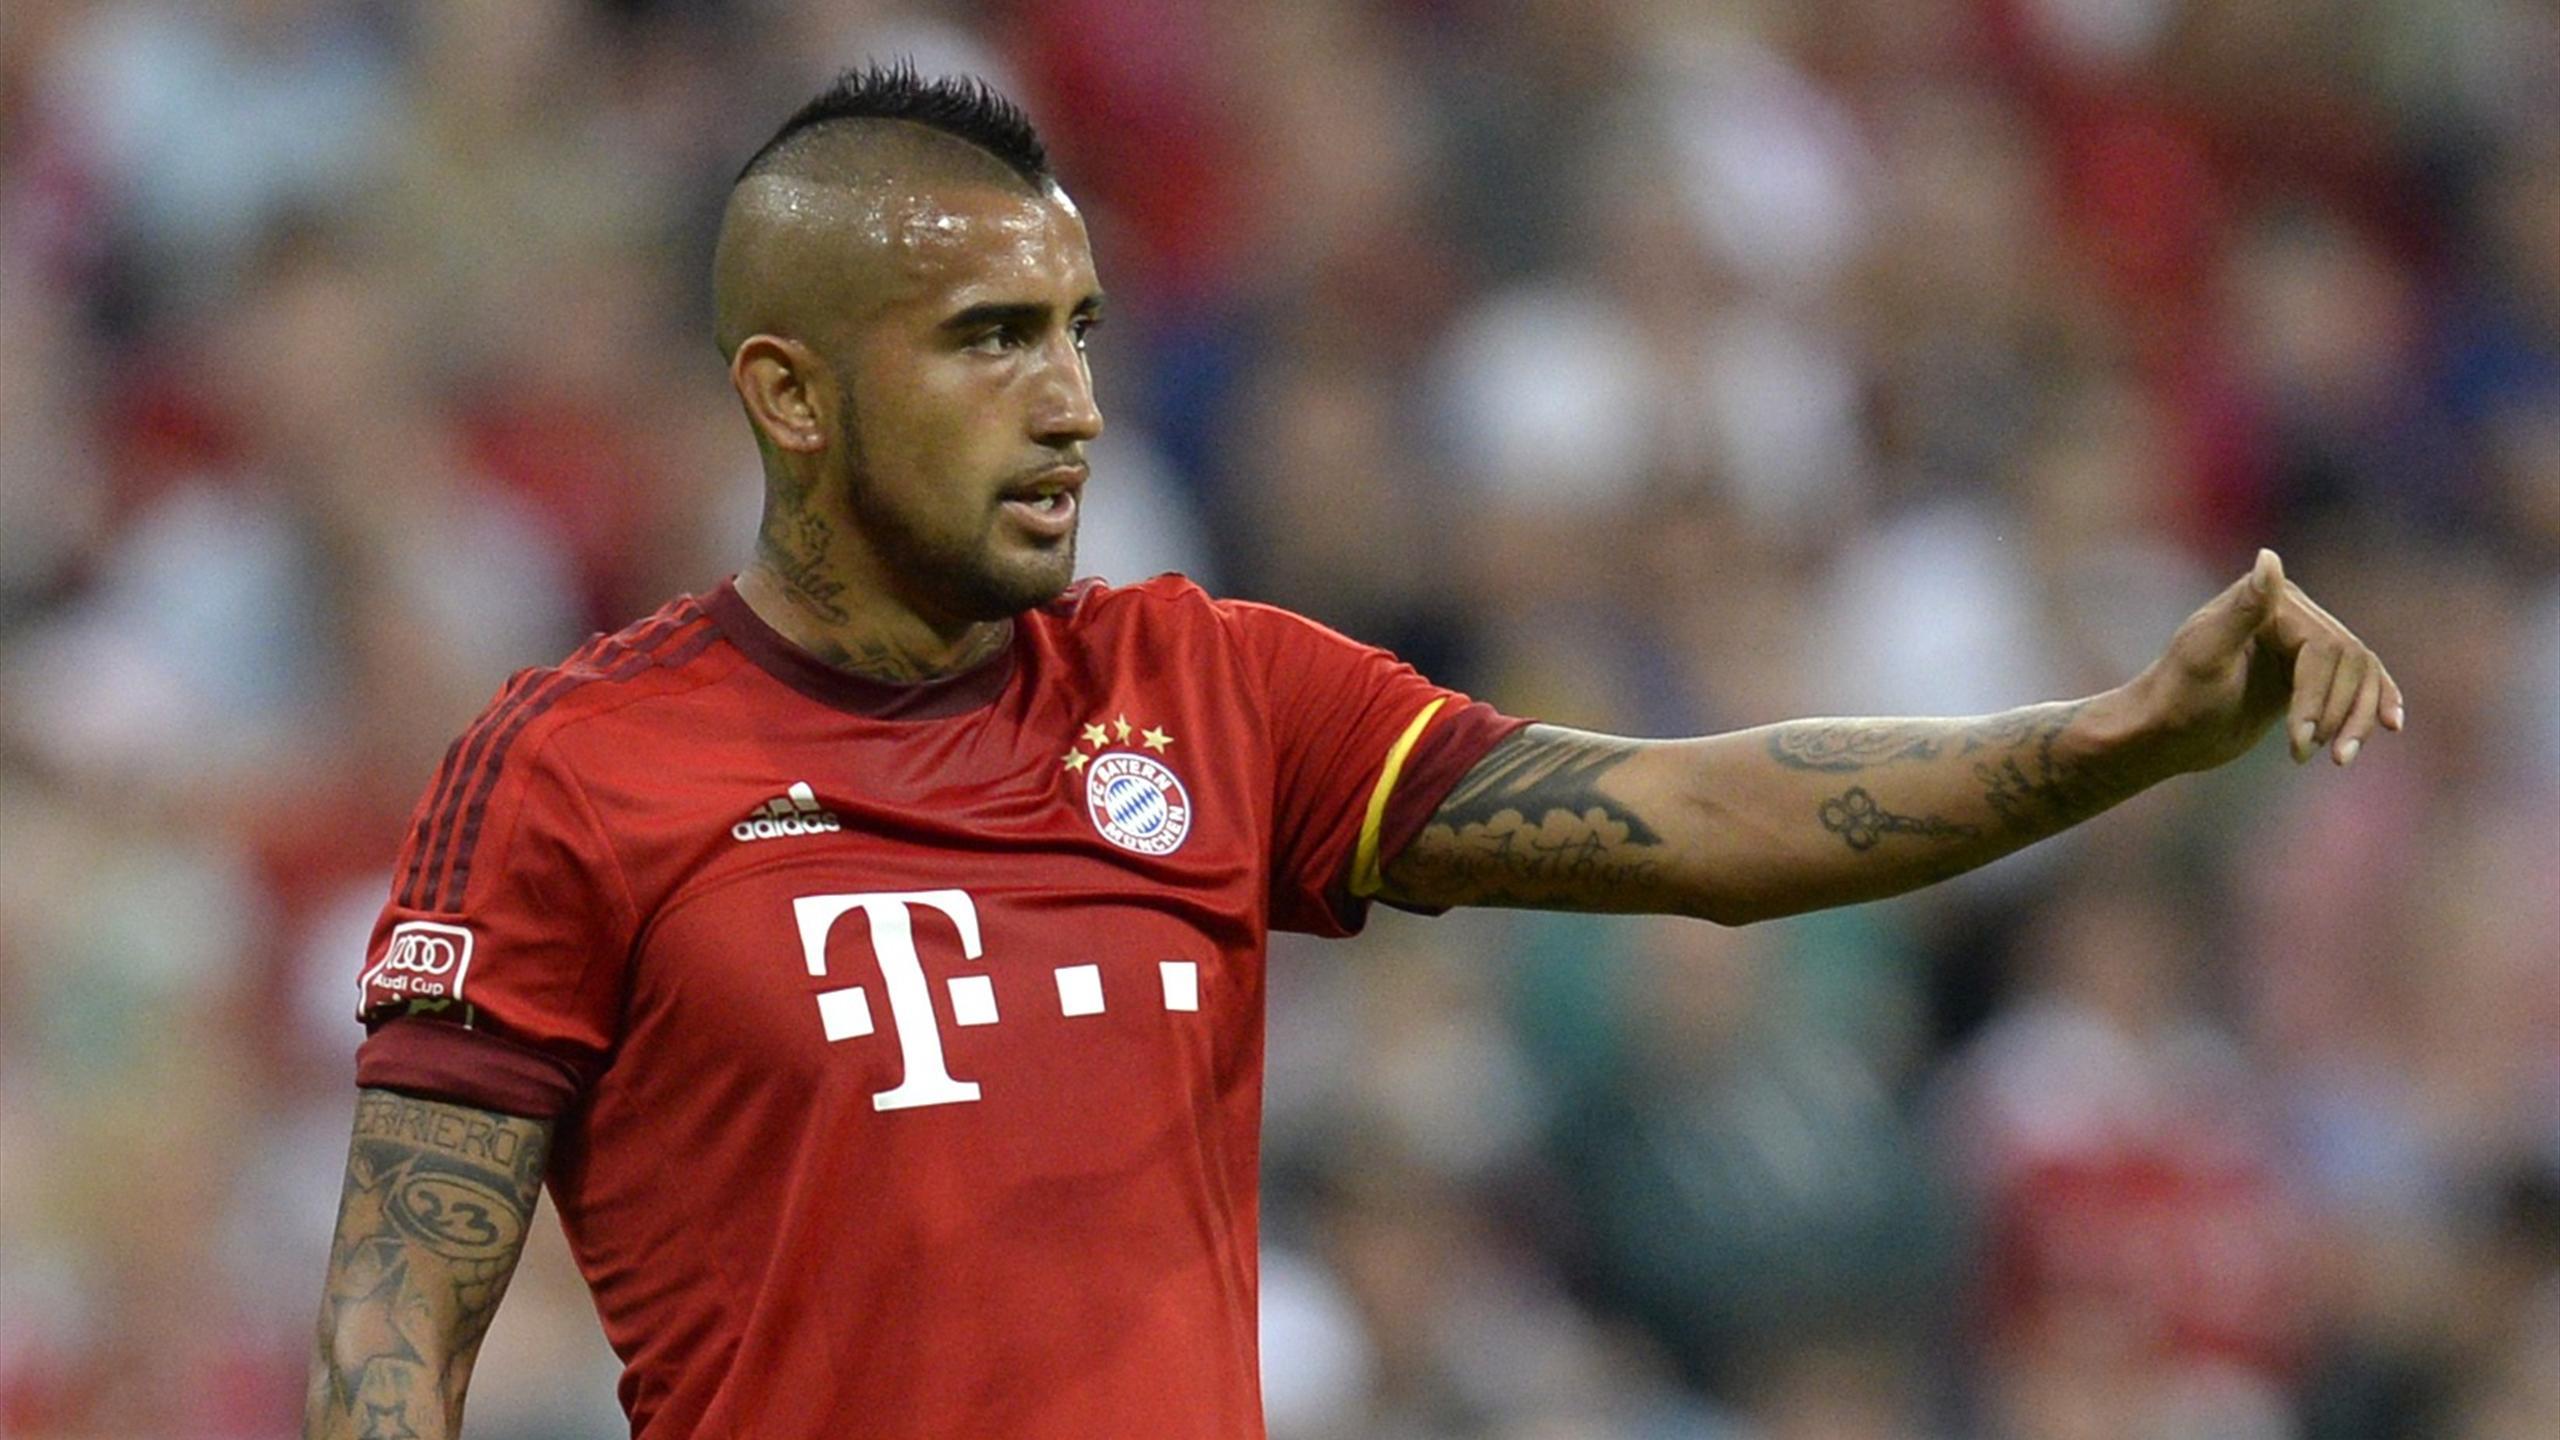 Arturo Vidal (Bayern Munich) contre l'AC Milan en Audi Cup, le 4 août 2015 à Munich